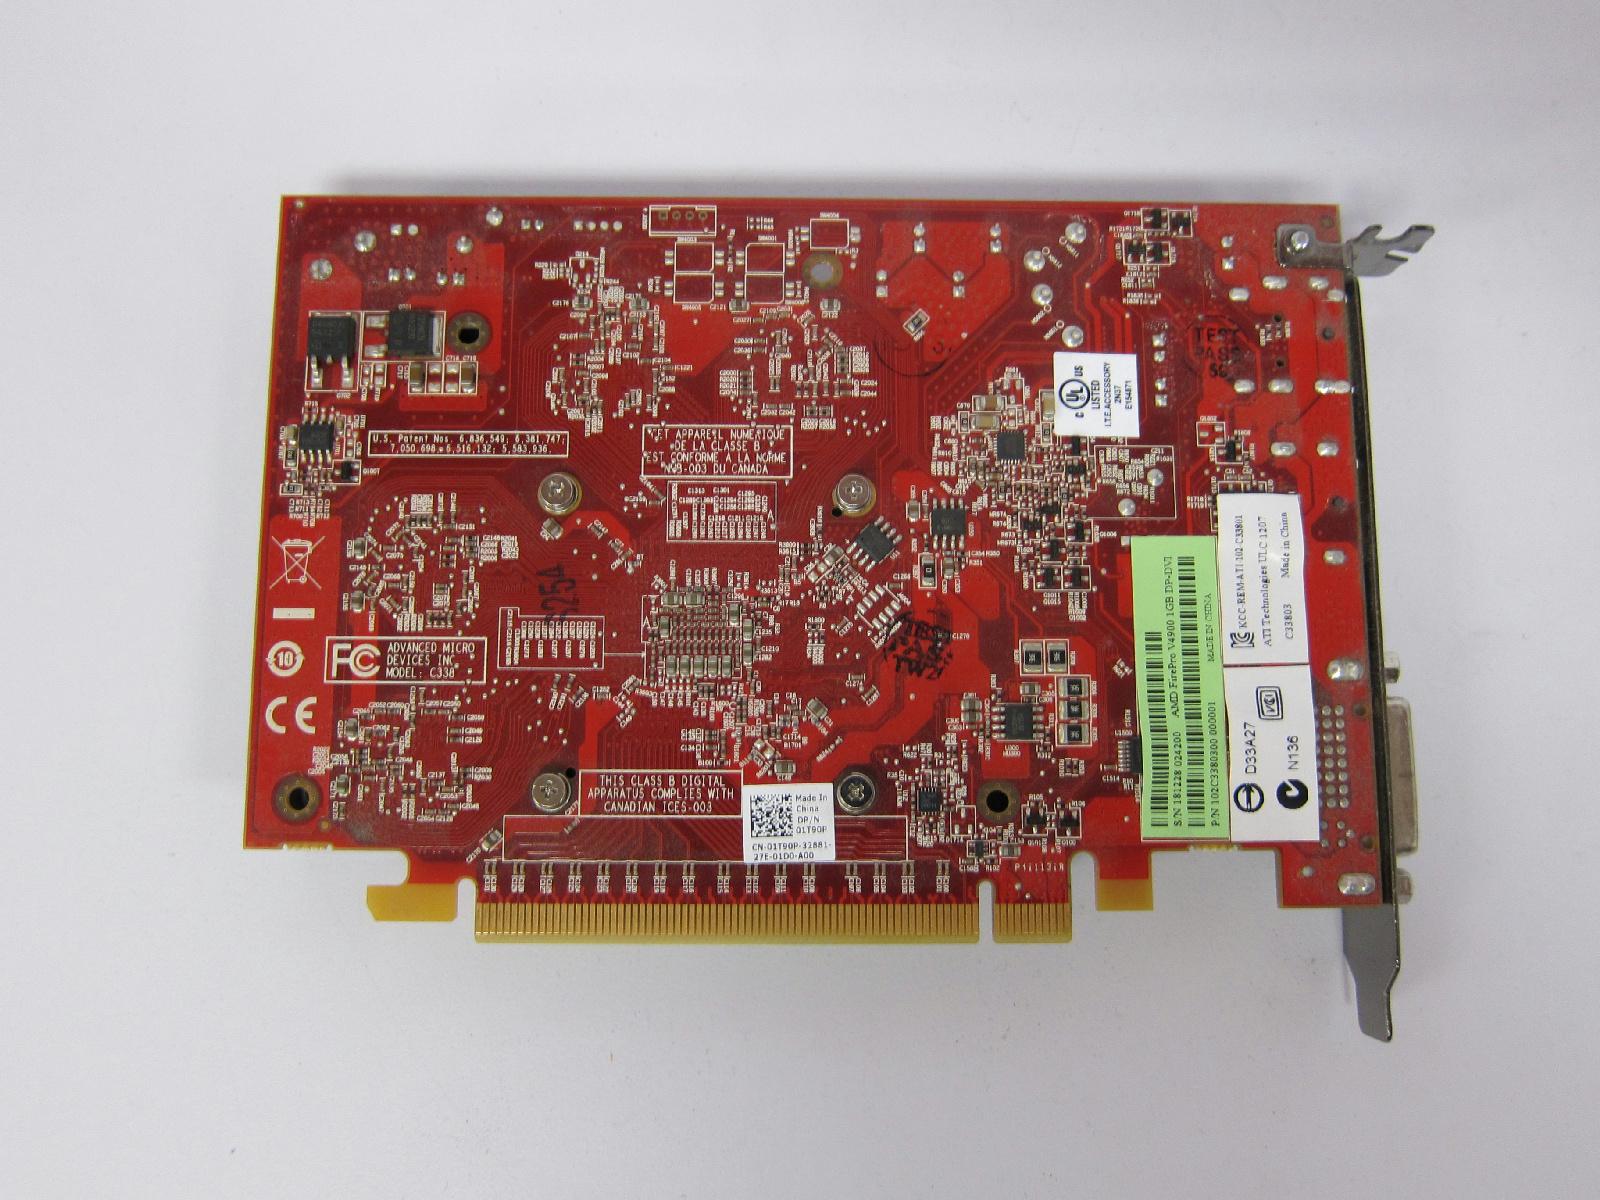 DVI 71219811H0G DP AMD Radeon HD8490 1GB Low Profile Video Card Display Port